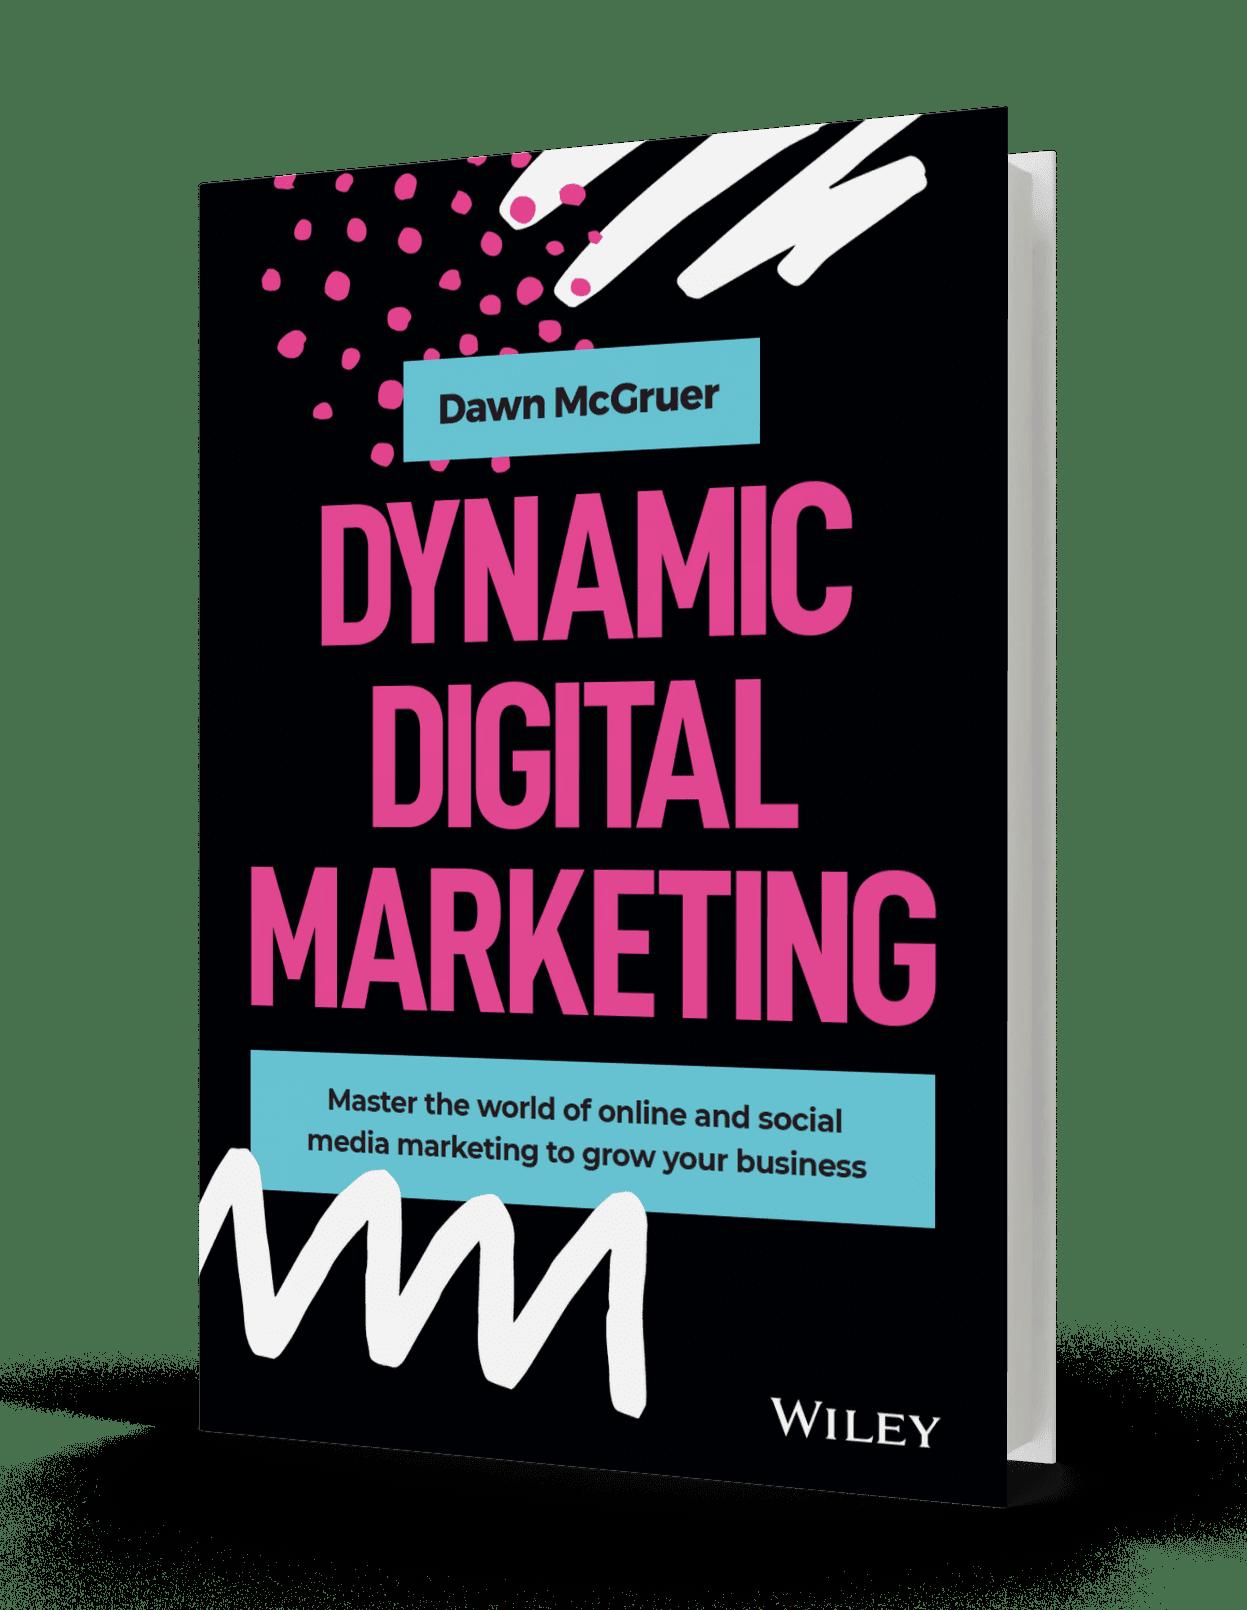 Dynamic Digital Marketing Book (upright)